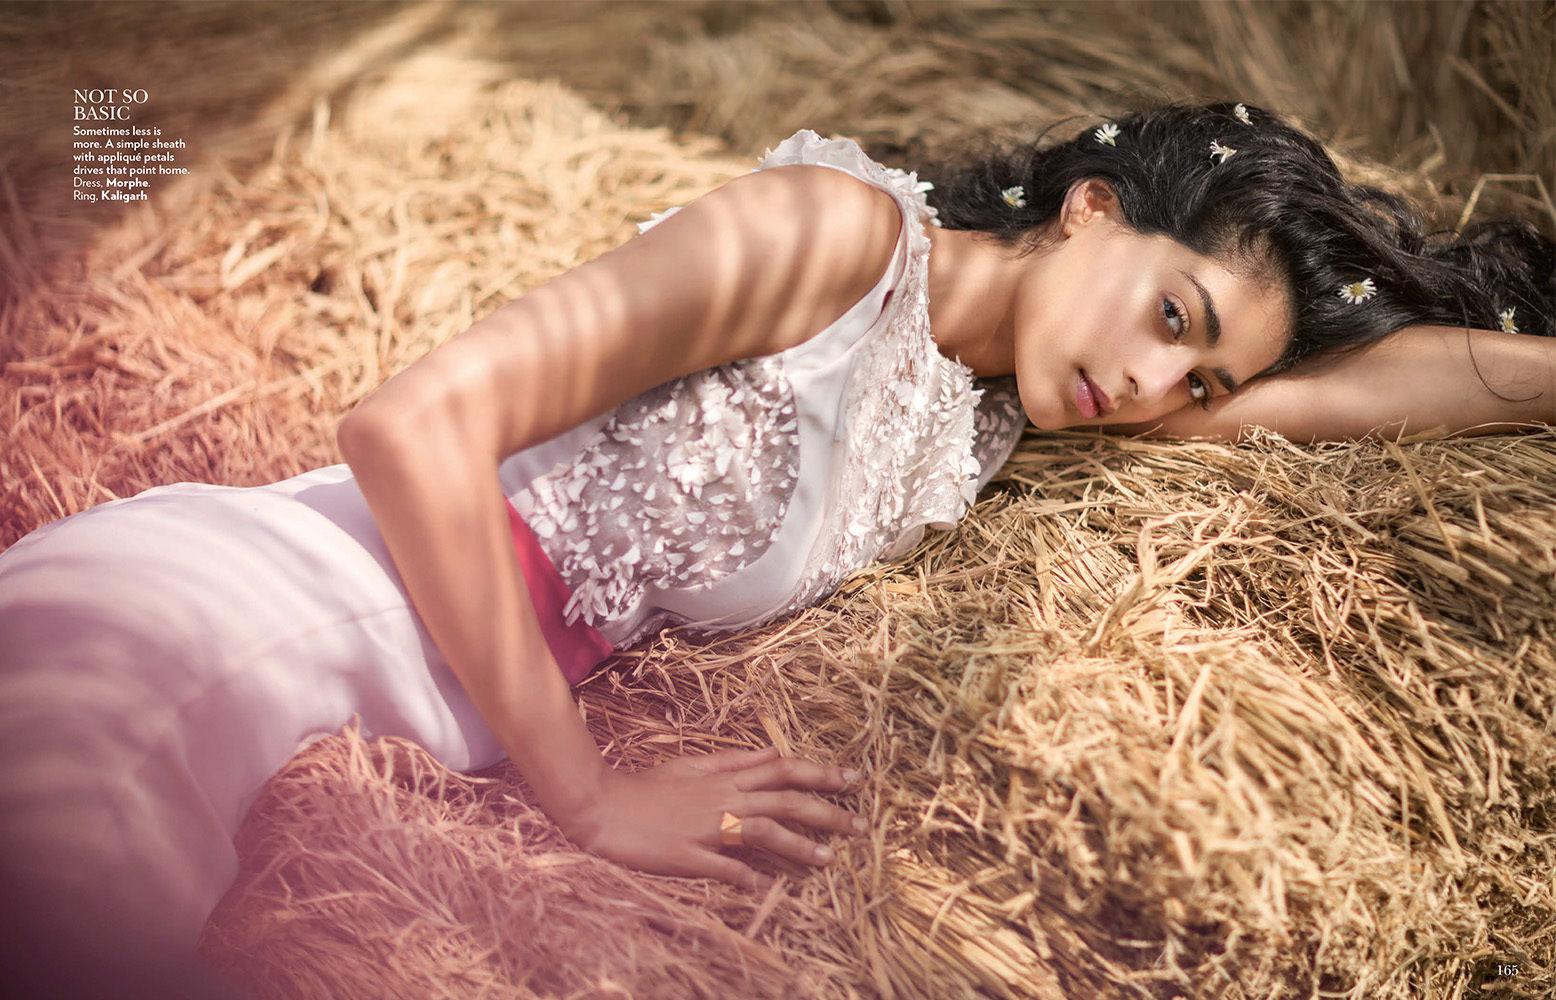 ANIMA CREATIVE  : Tania Travers for VOGUE India